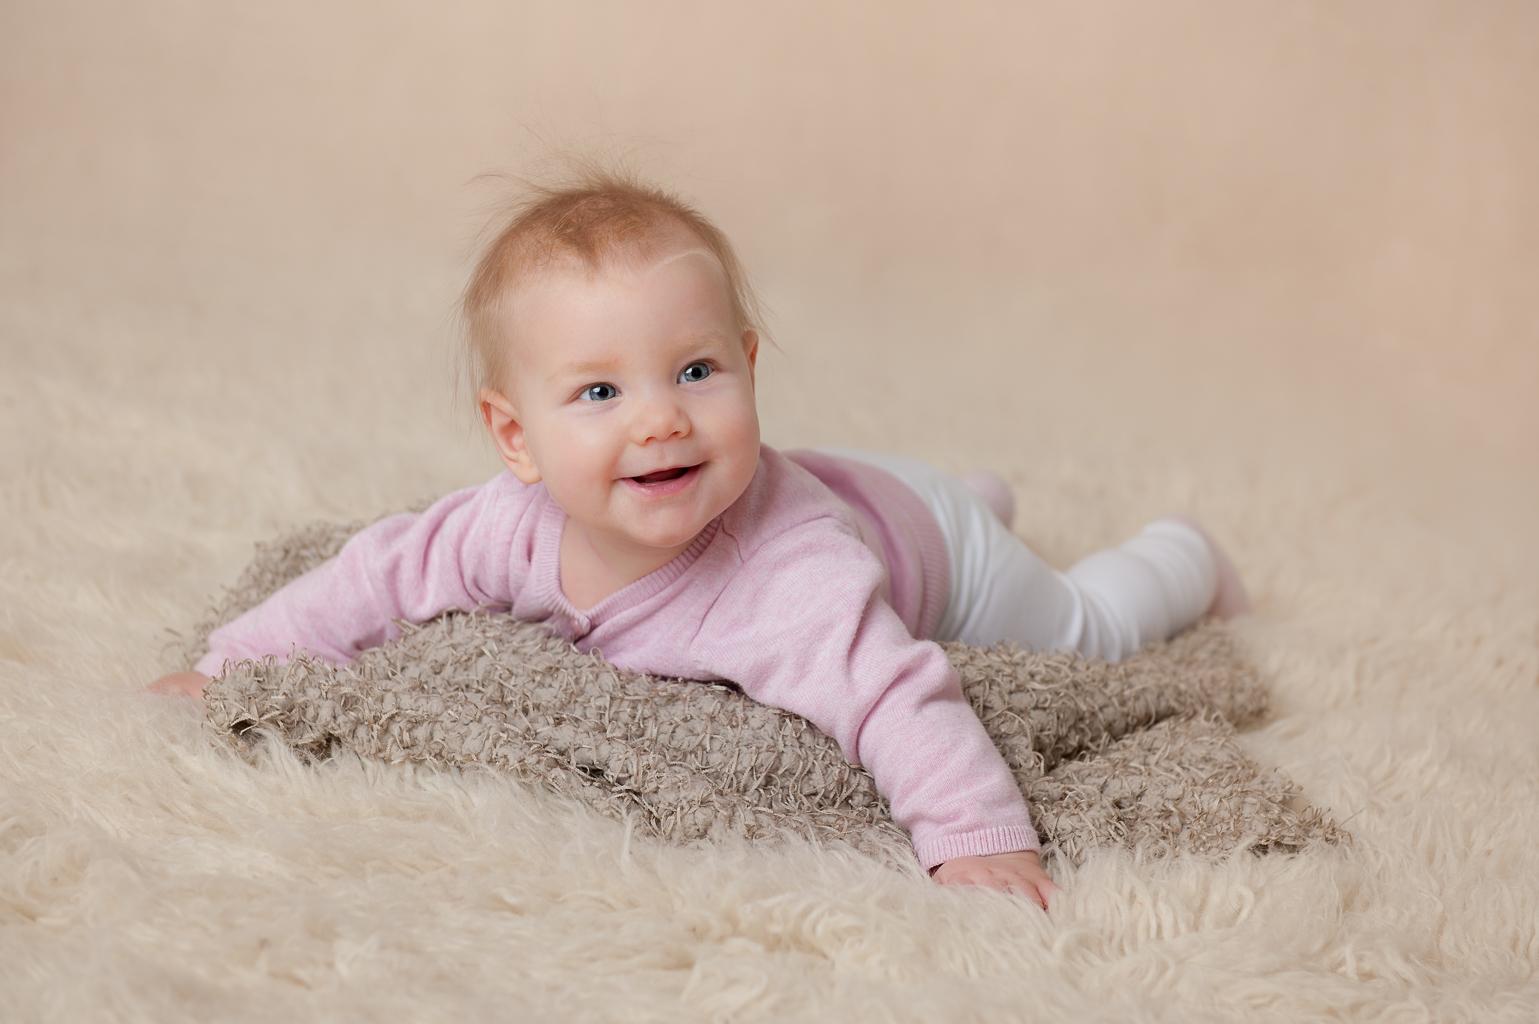 Familien baby neworn kinder fotografie oerlenbach schweinfurt bad kissingen-4